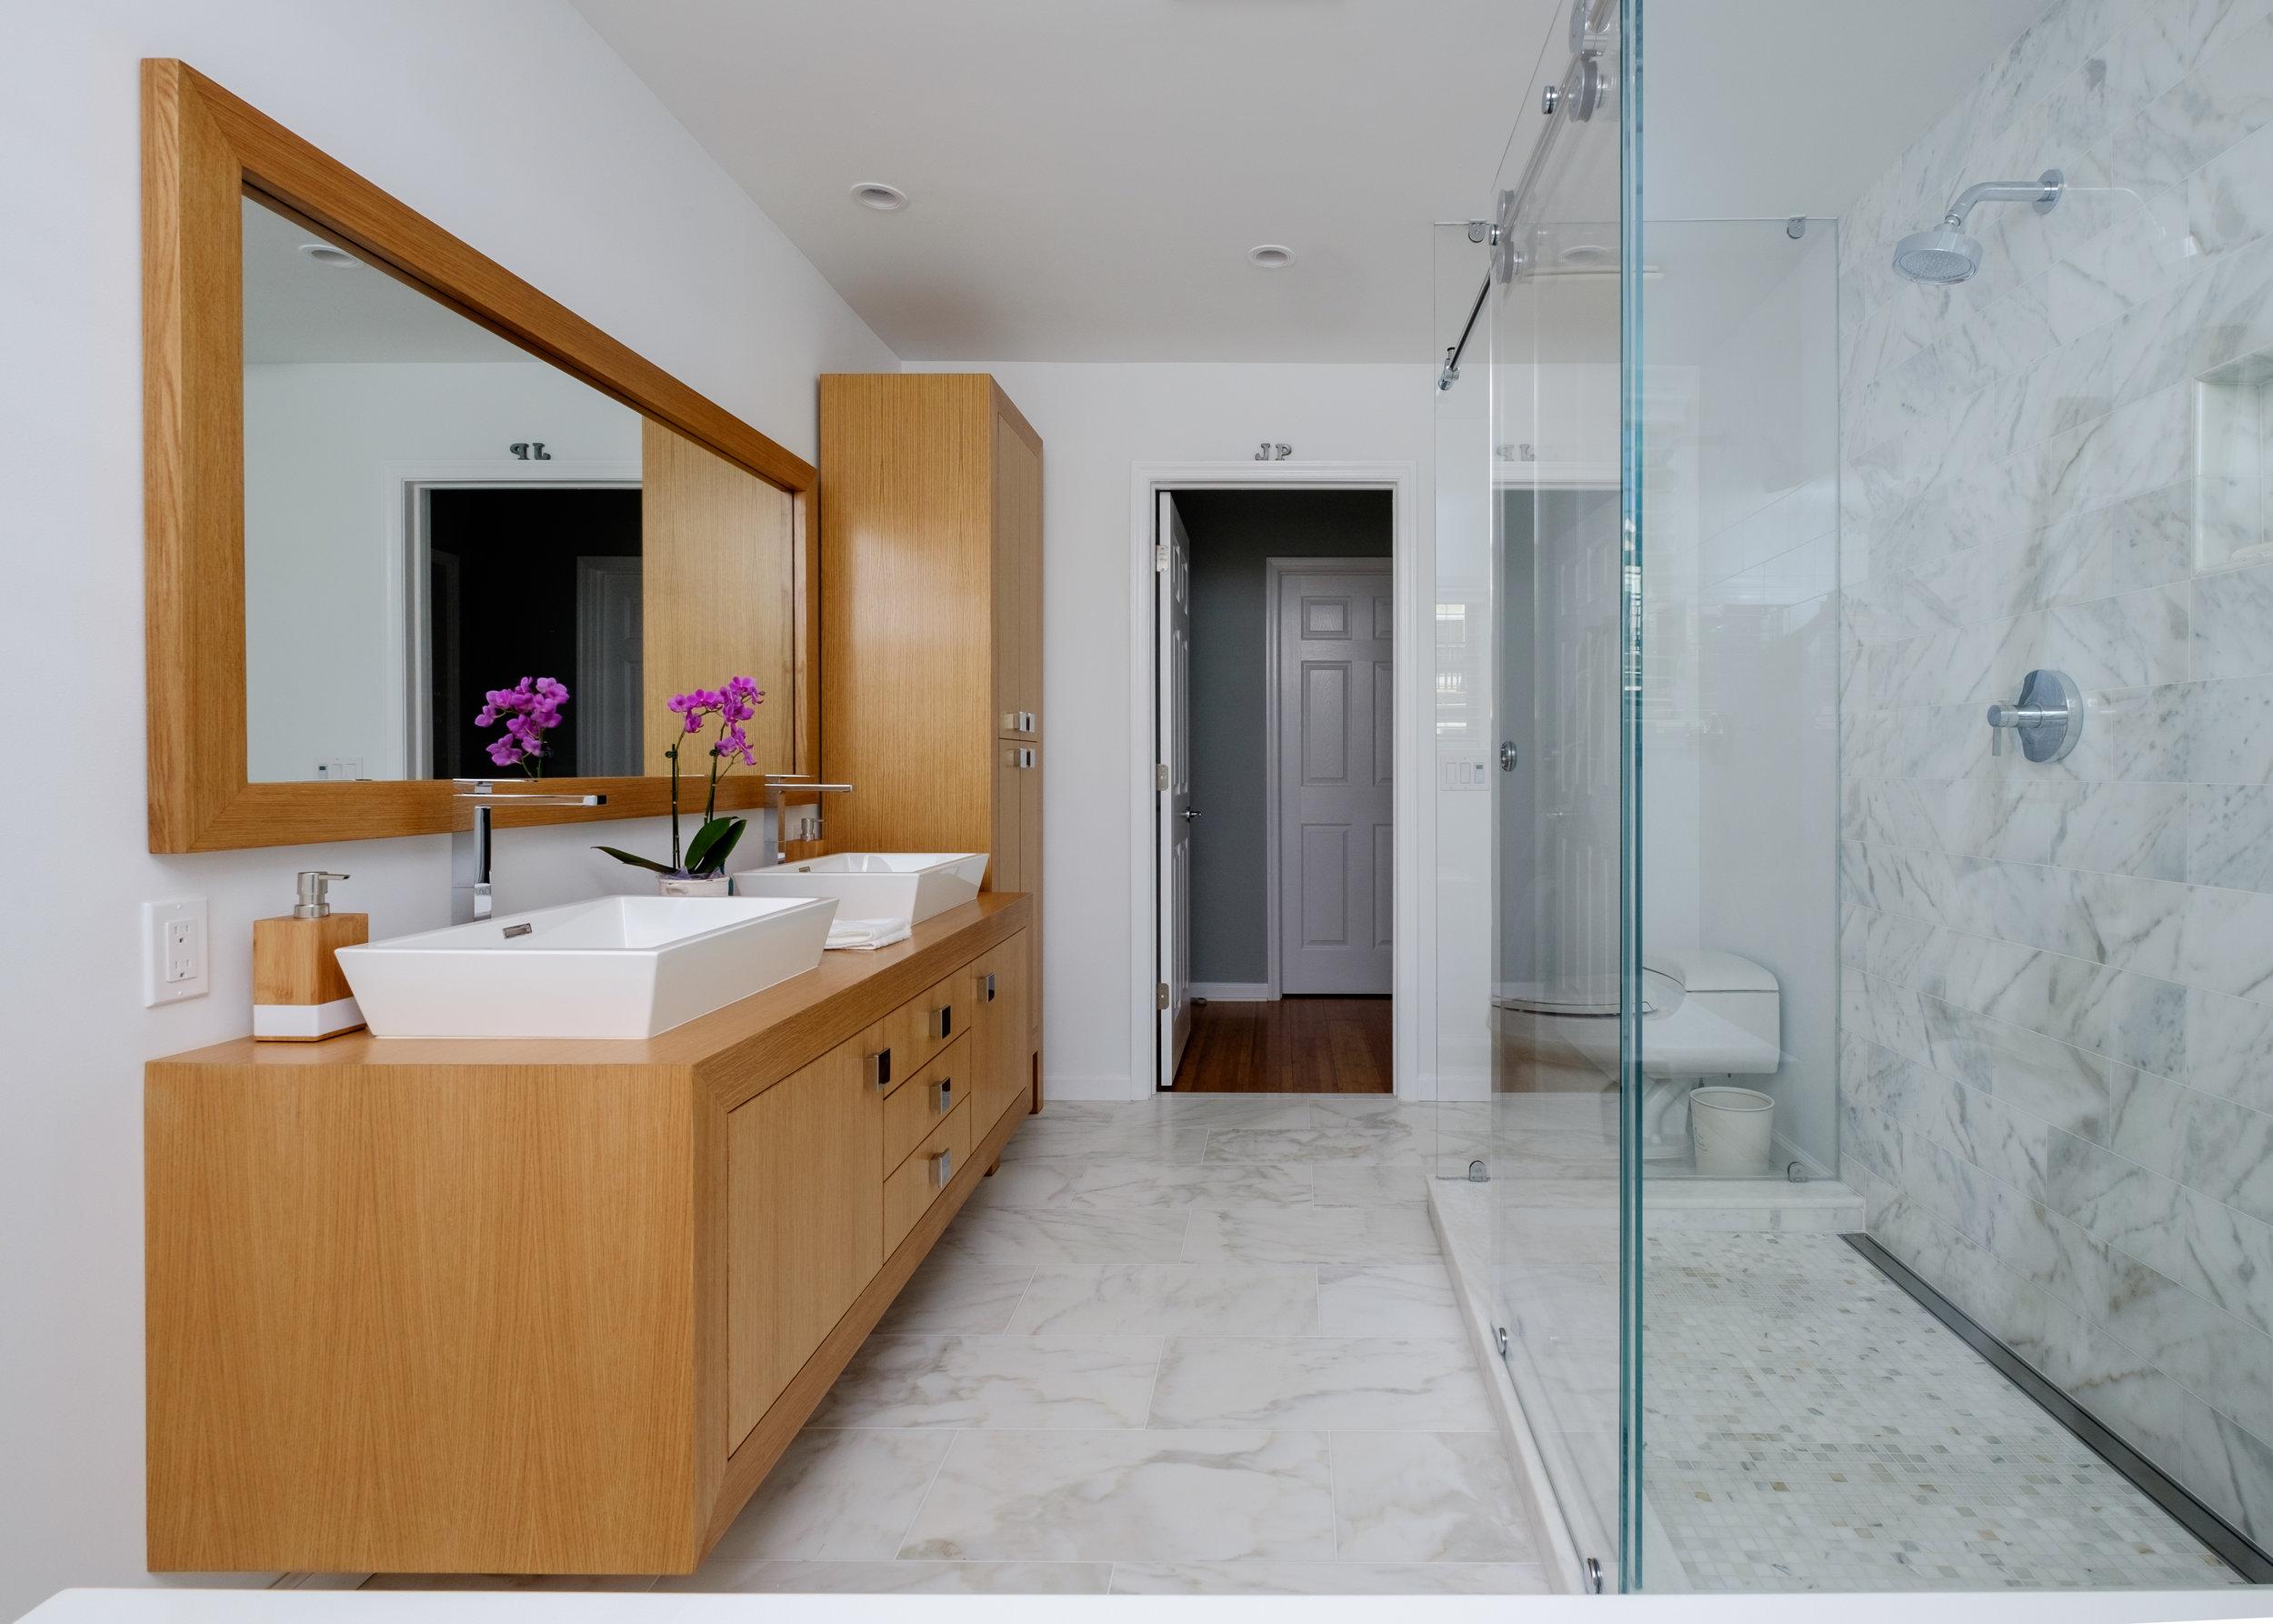 Double Vanity and Freestanding Cabinet